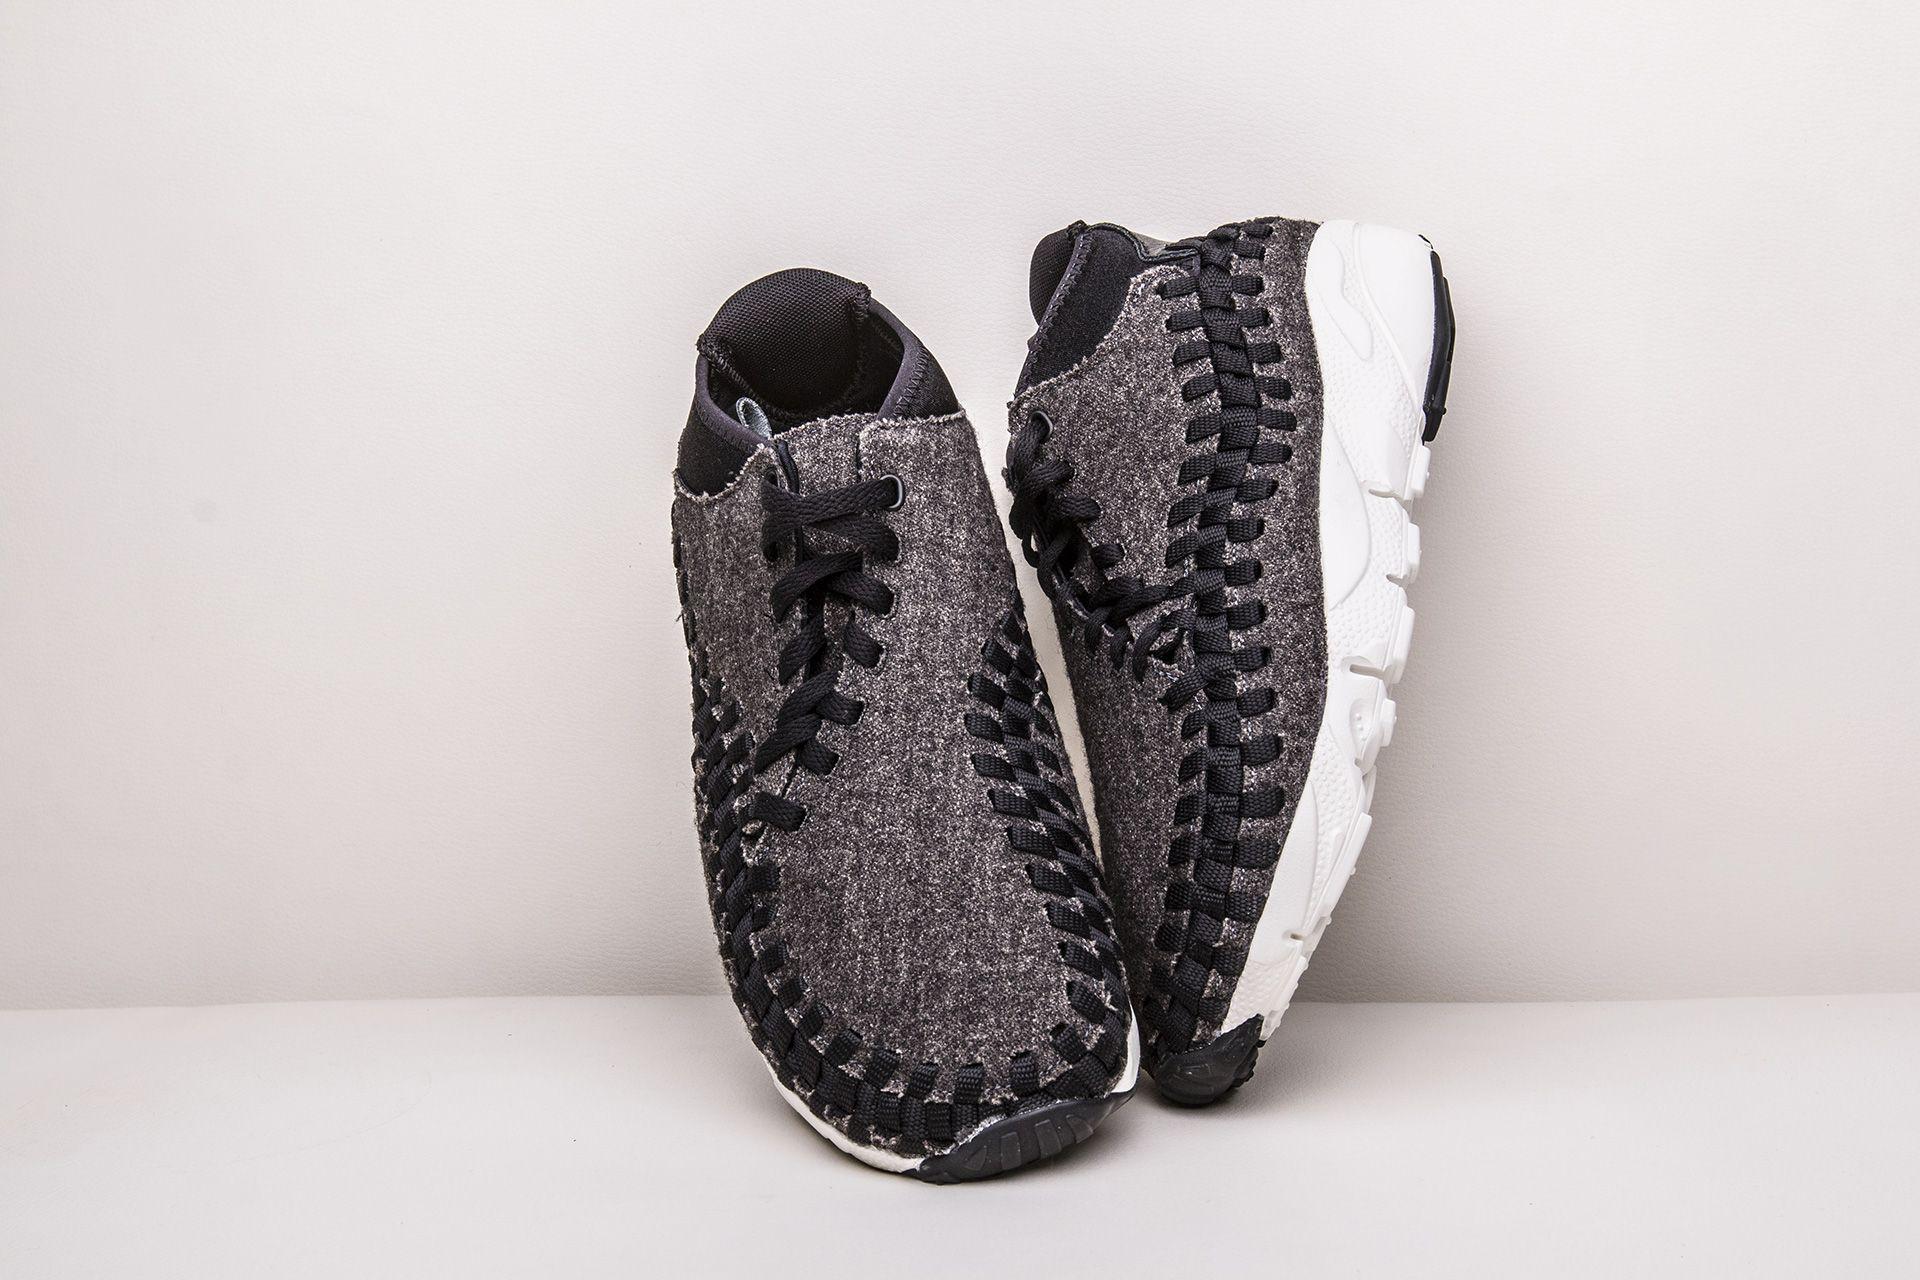 quality design c4948 f73a0 ... Купить мужские черные кроссовки Nike Air Footscape Woven Chukka SE -  фото 2 картинки ...